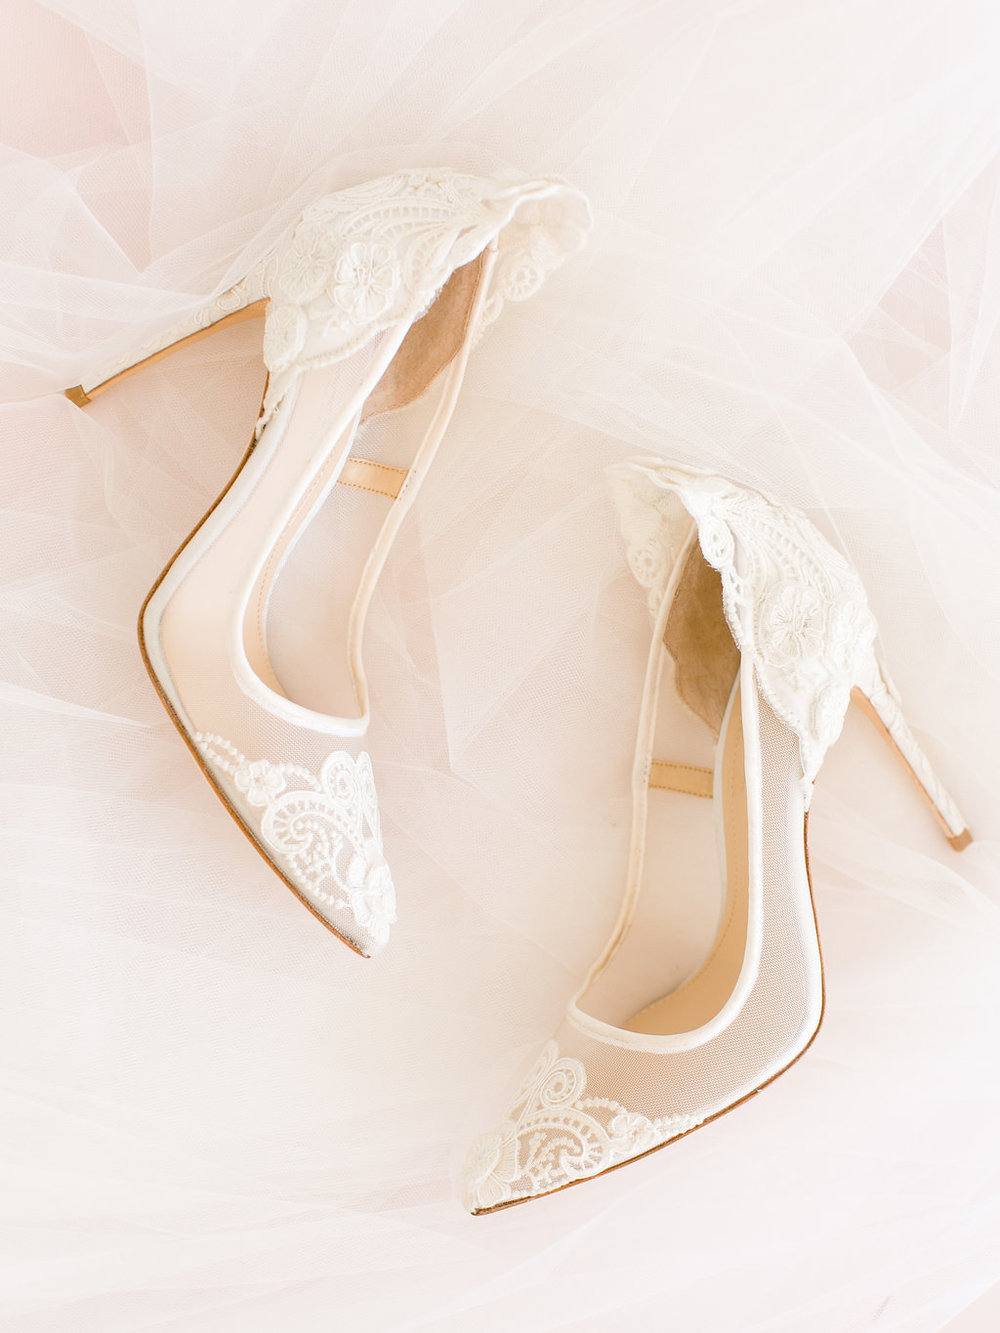 Best-Austin-Denver-California-Wedding-Photographer-Nest-Ruth-Farms-2.jpg